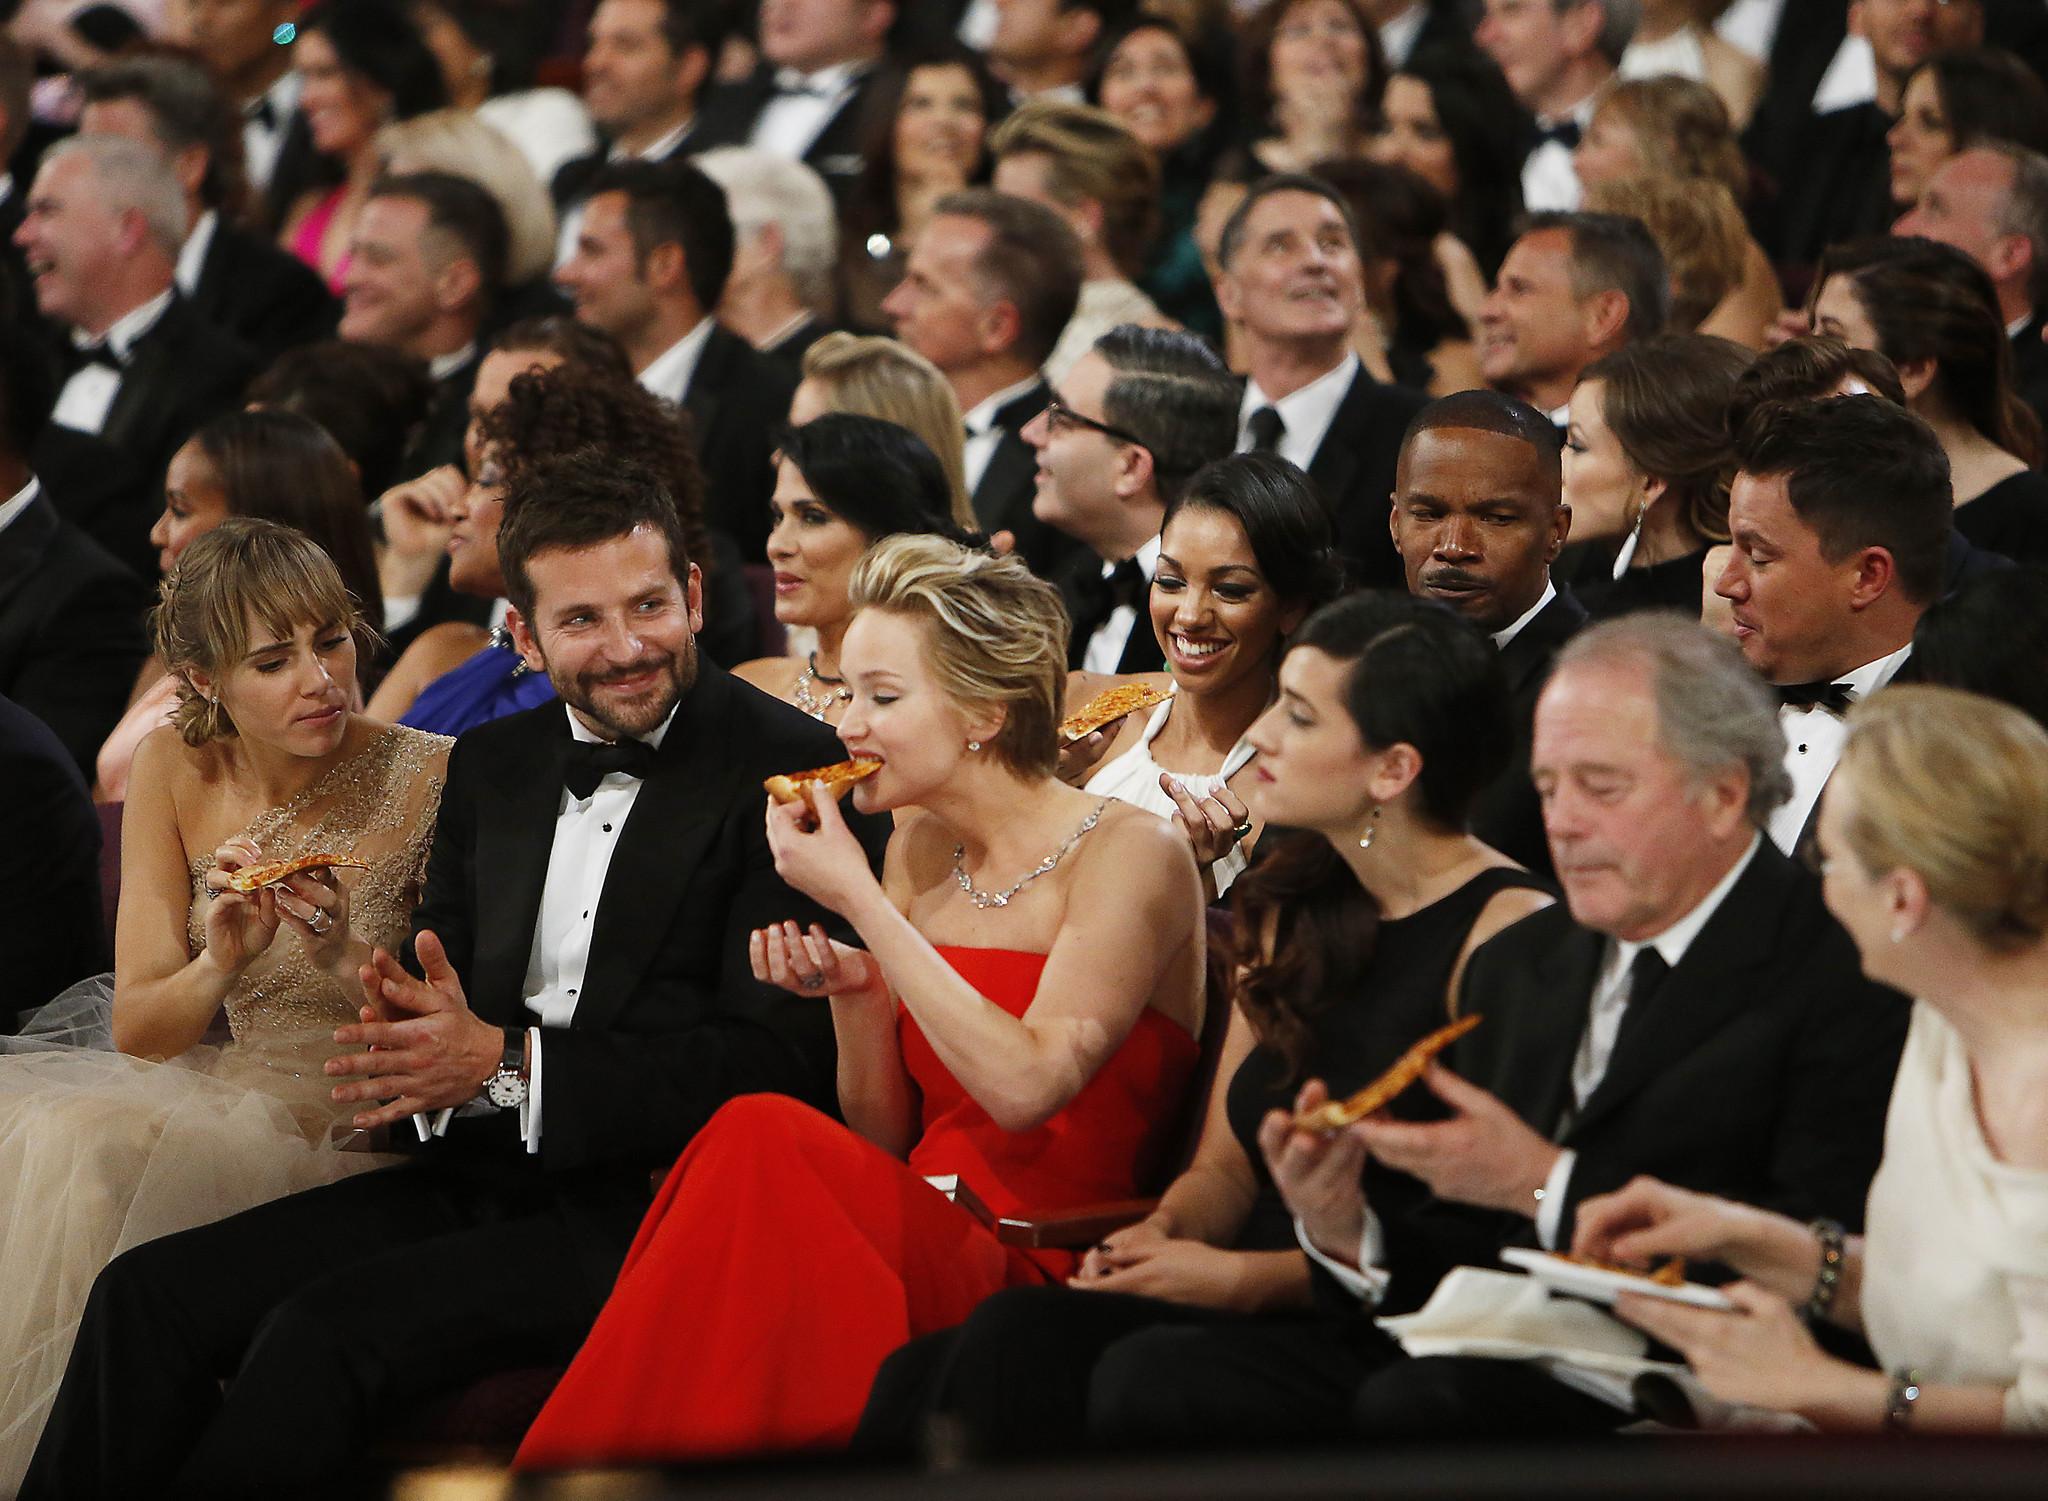 Academy Awards 2014 – Wonderful Image Gallery